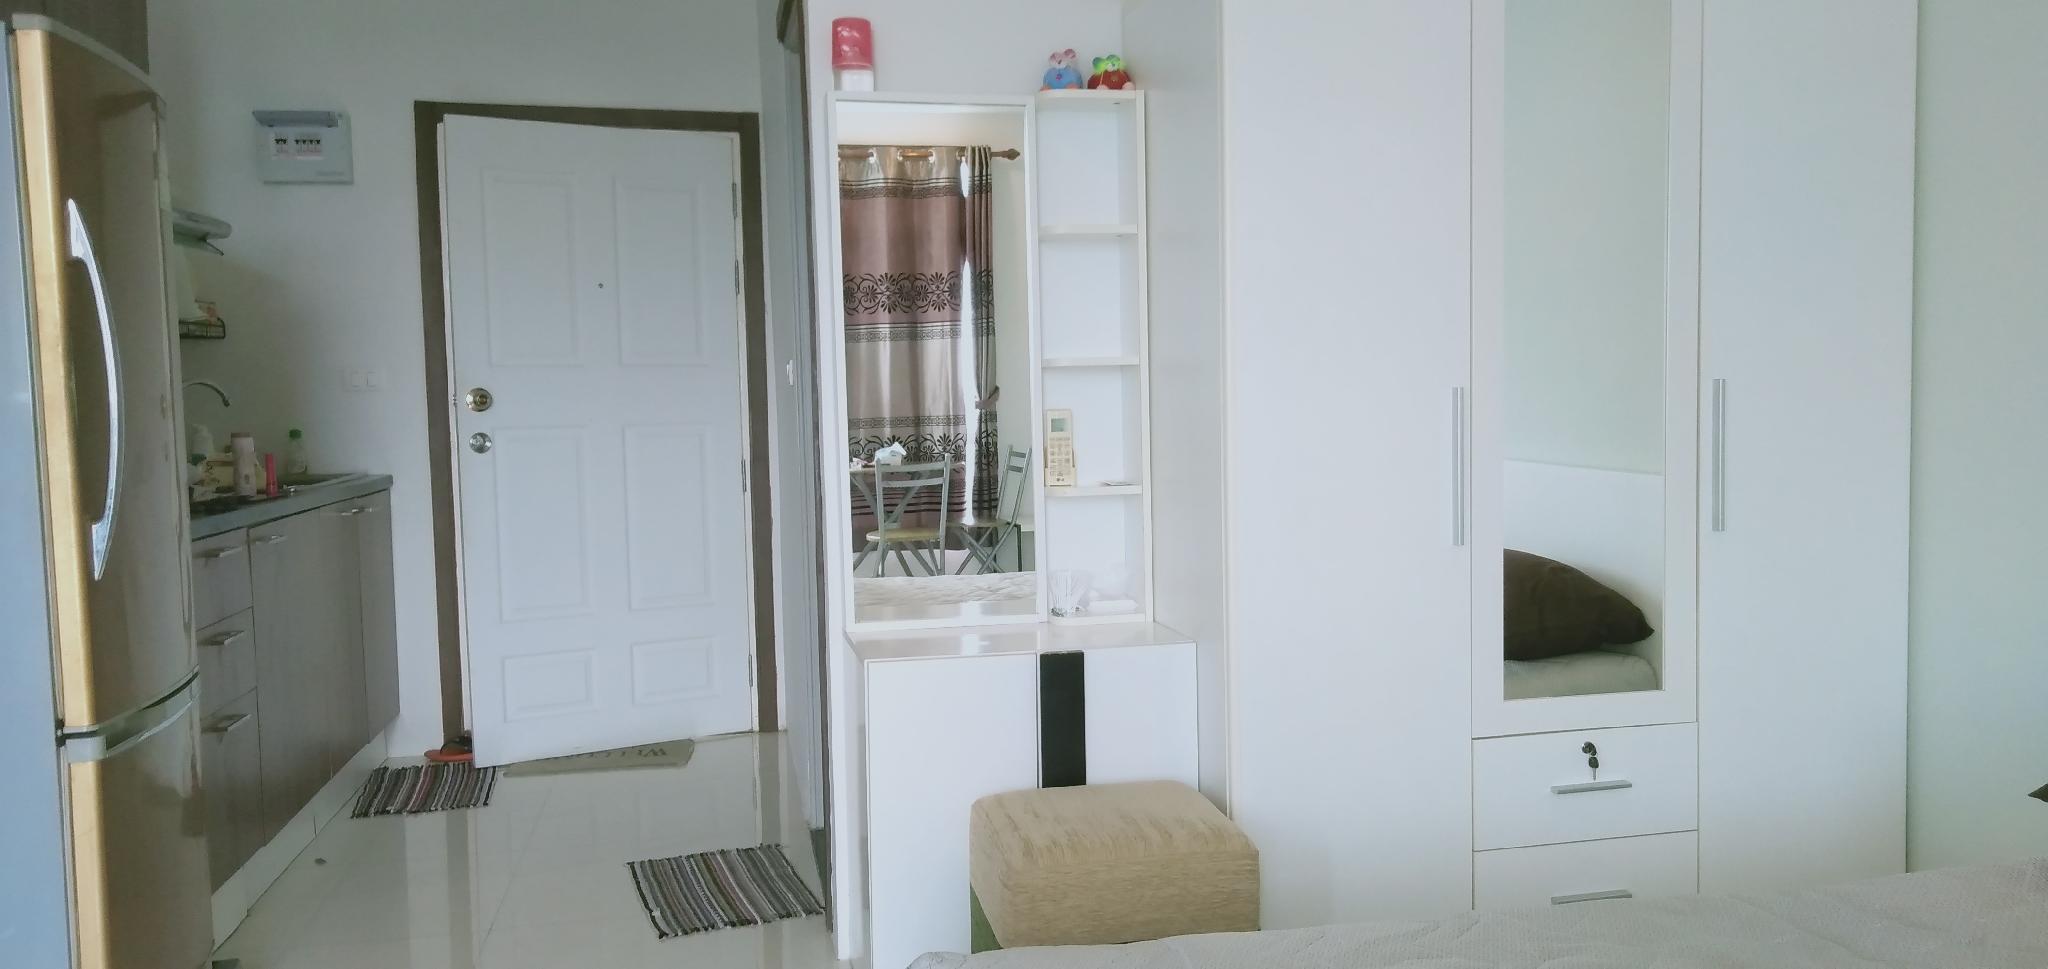 Perfect Praranoma View สตูดิโอ อพาร์ตเมนต์ 1 ห้องน้ำส่วนตัว ขนาด 30 ตร.ม. – ฉลอง